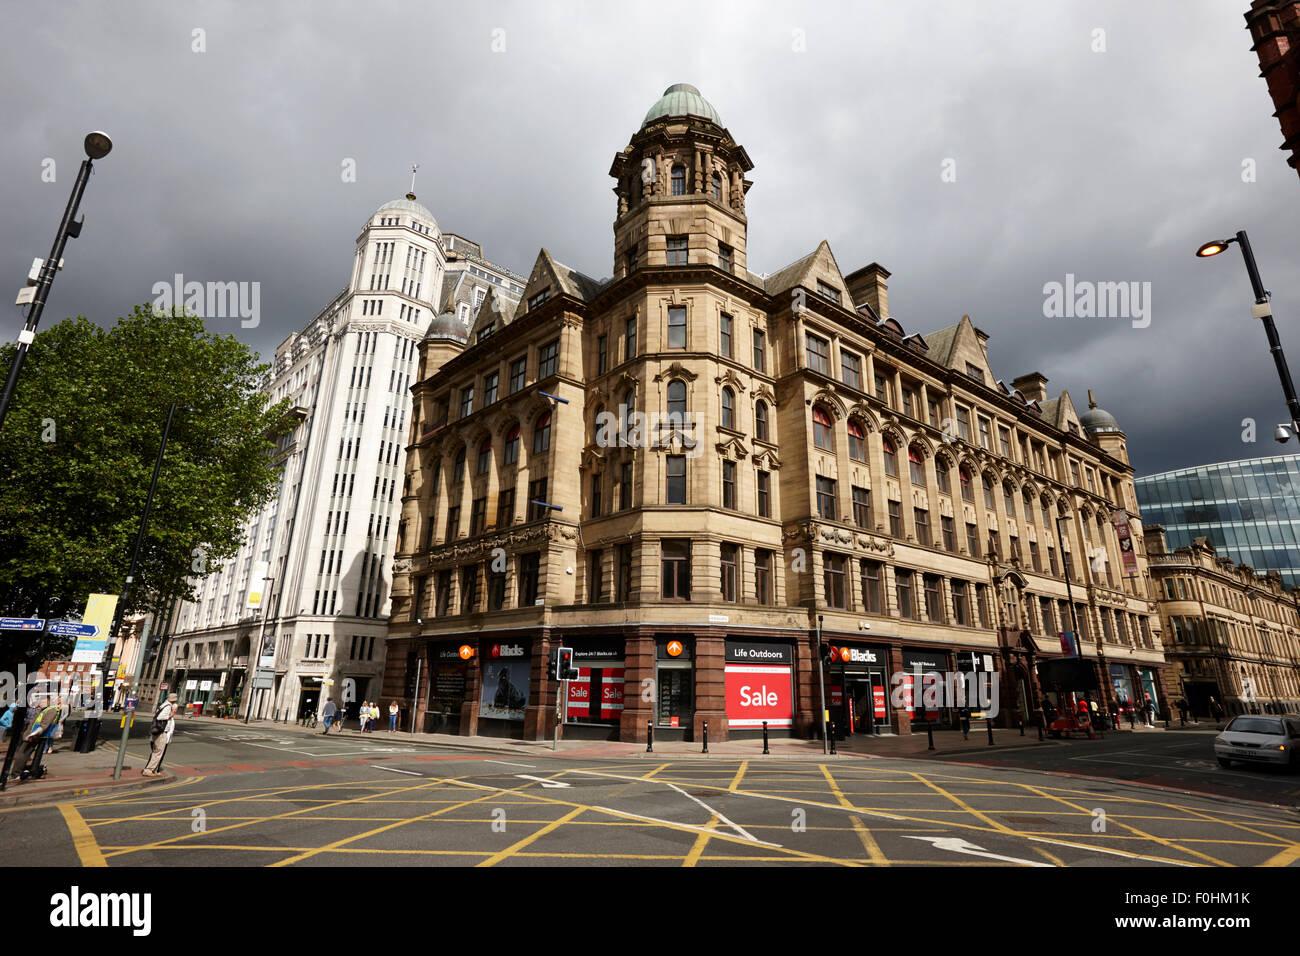 landmark buildings on 196 deansgate main thoroughfare Manchester city centre  England UK - Stock Image